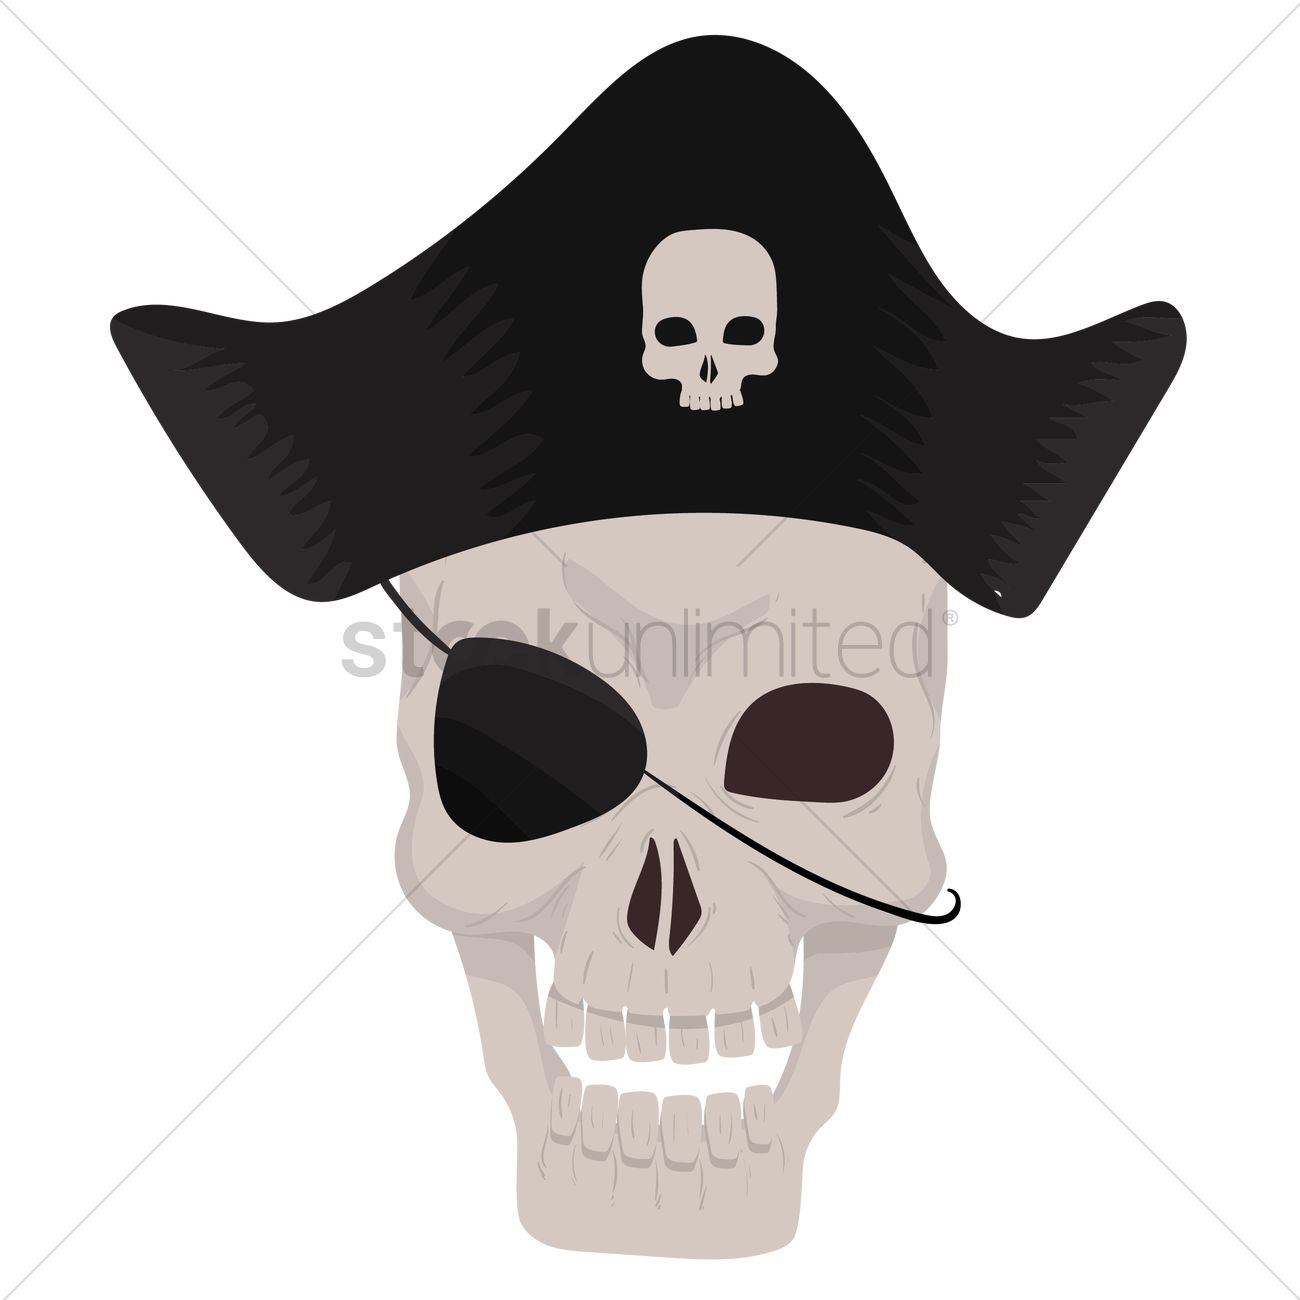 b5447bc60 Free Pirate skull wearing pirate hat Vector Image - 1299979 ...